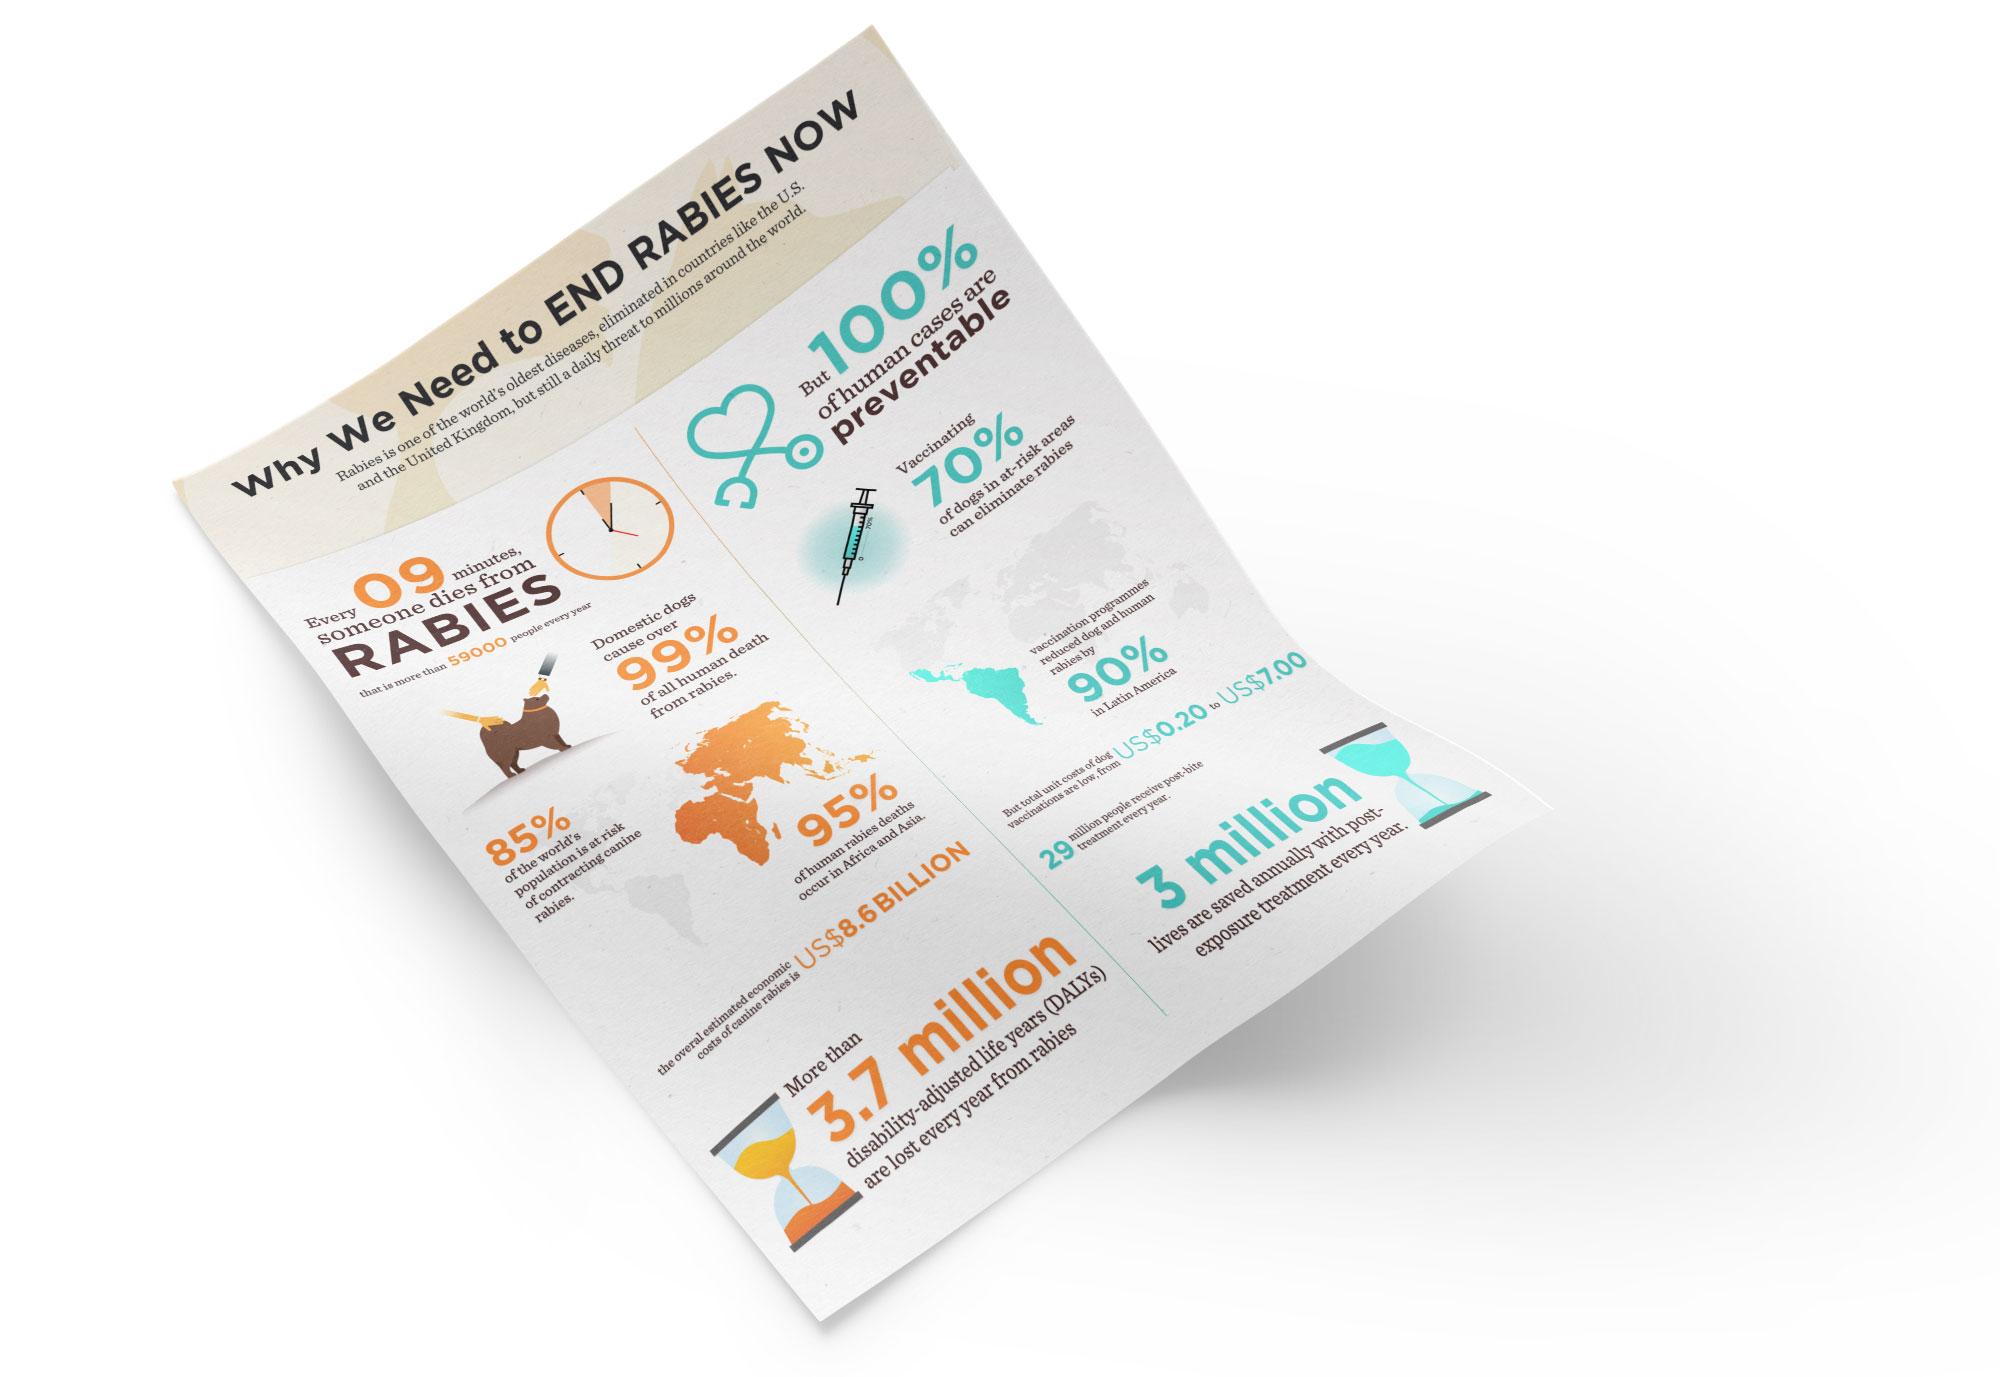 garc-infographic.jpg